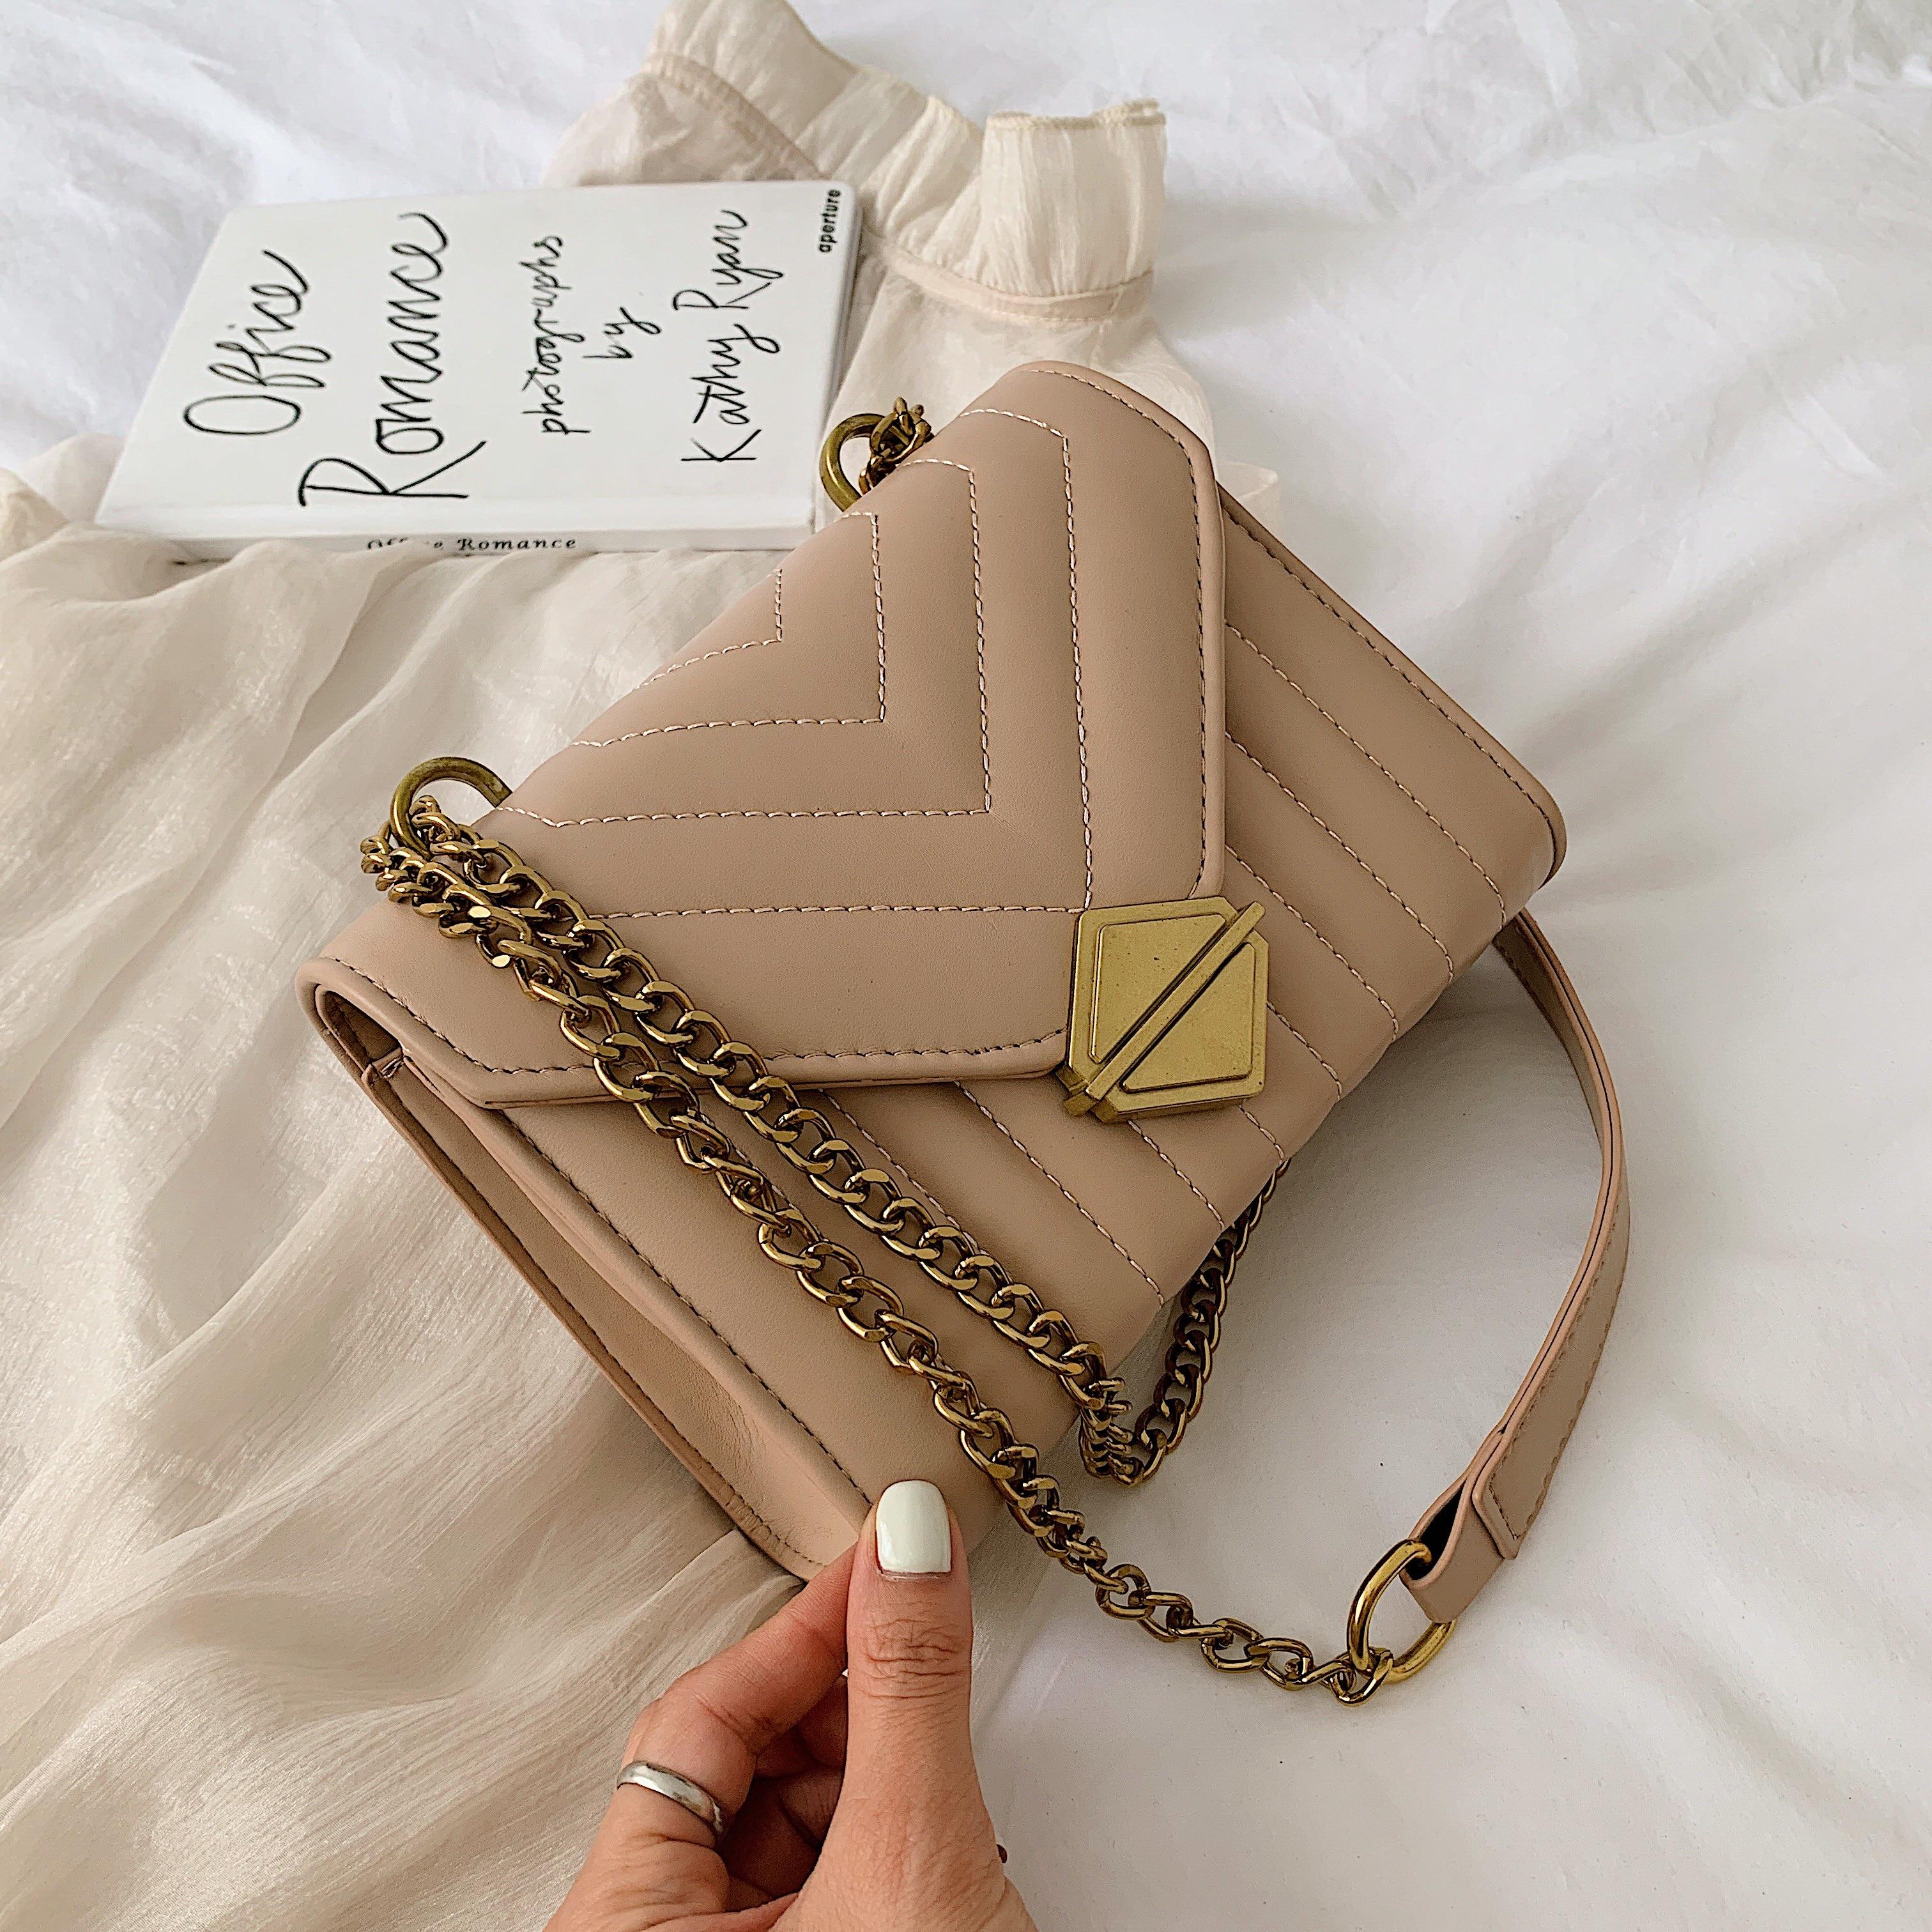 Chain Pu Leather Small Crossbody Bags For Women 2020 Fashion Ladies Shoulder Messenger Bag Female Travel Simple Handbags